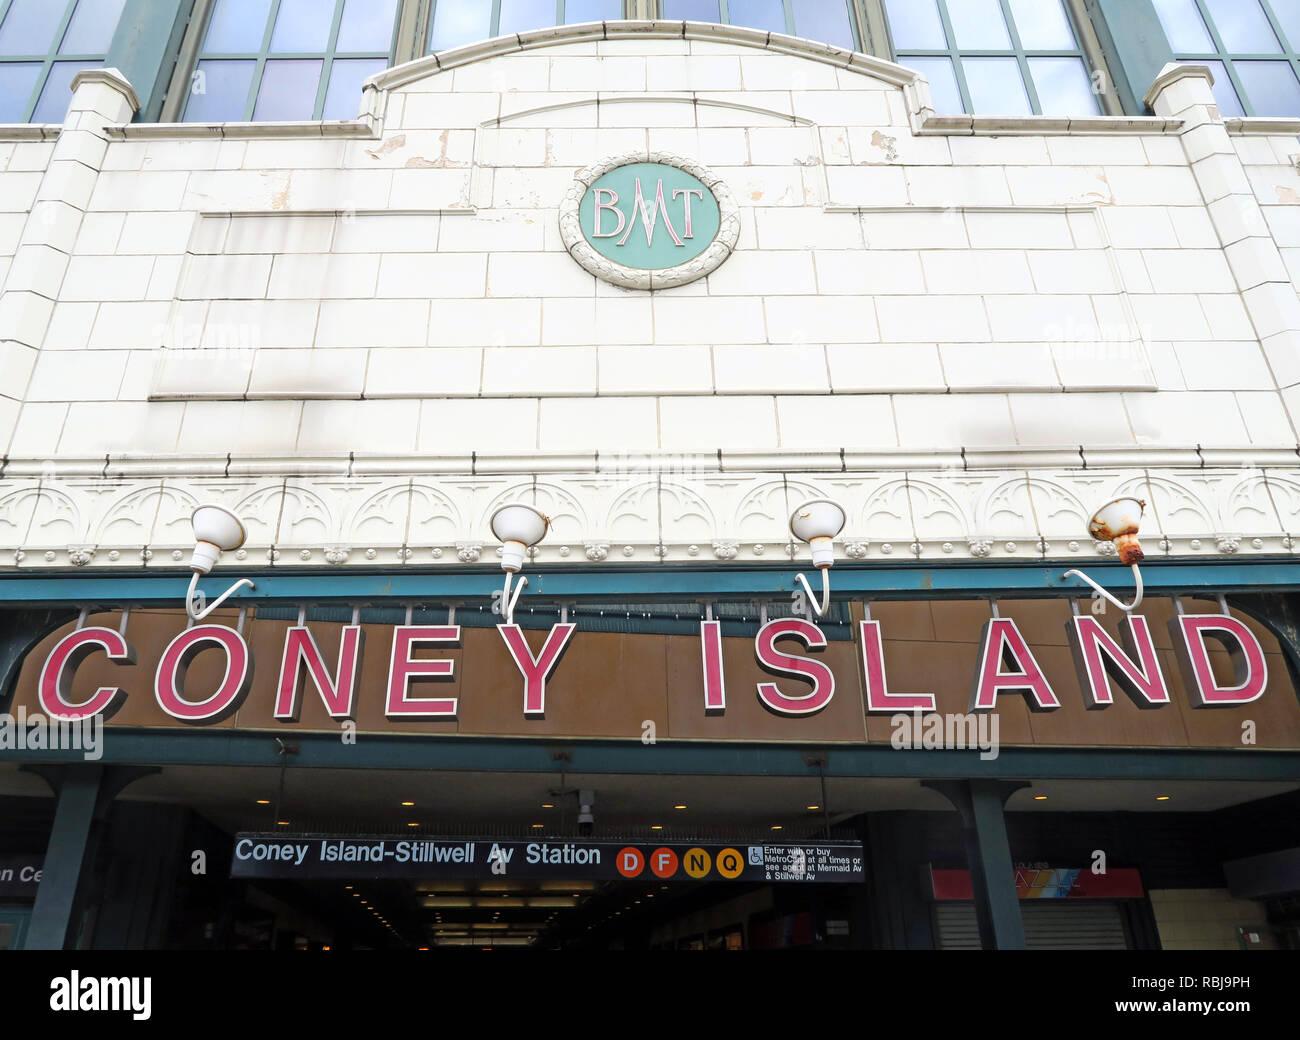 Coney Island BMT subway station, Stillwell Avenue, Brooklyn, NYC, NY, USA - Stock Image